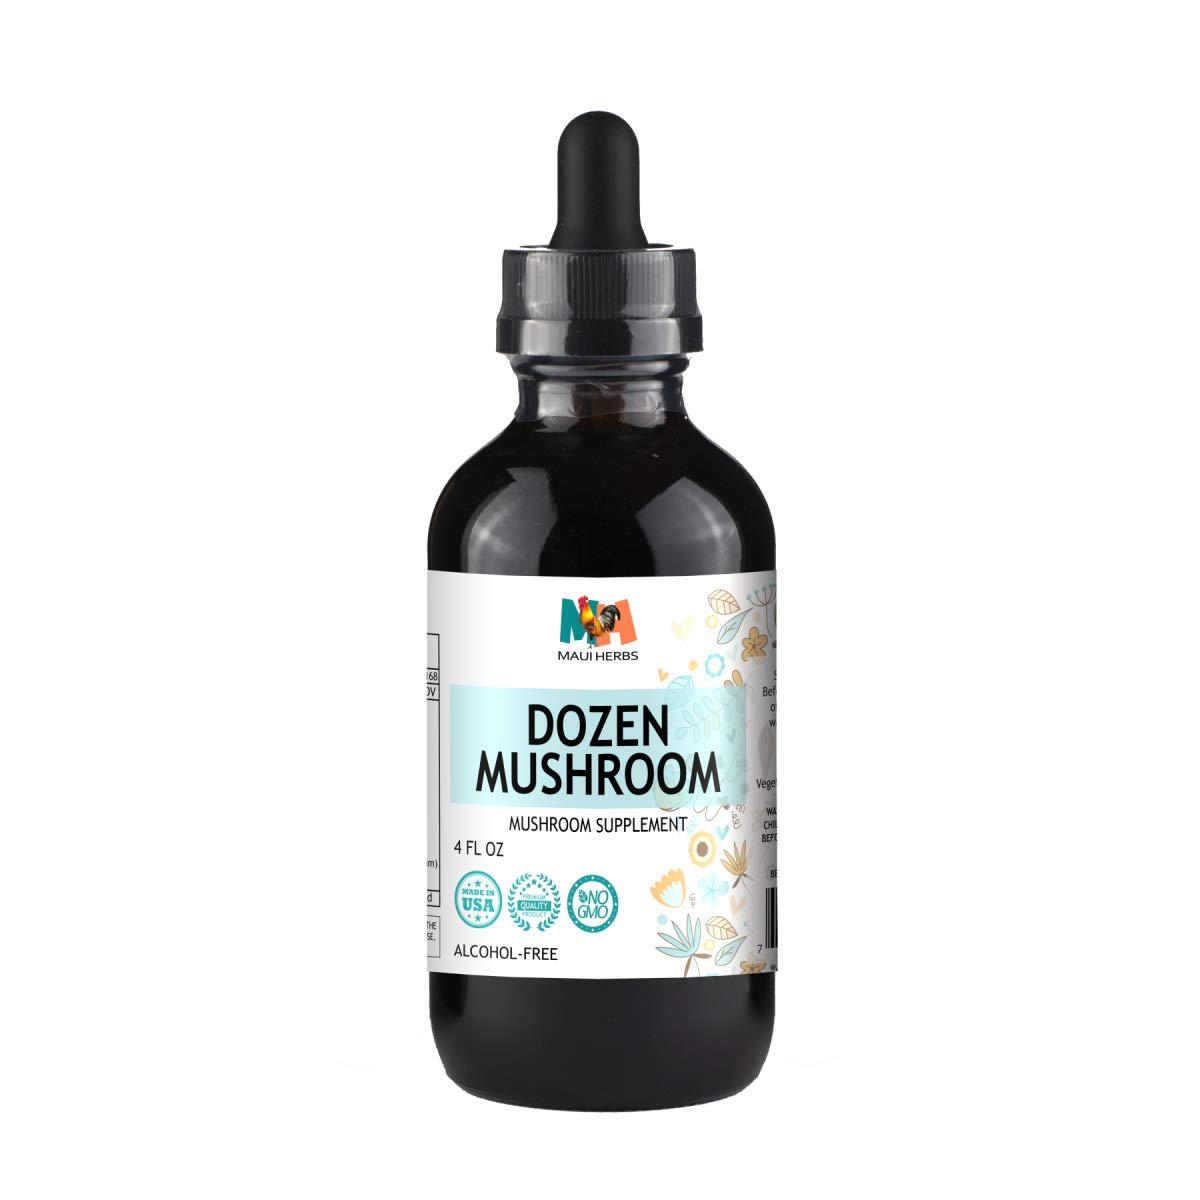 Dozen Mushroom Immune Support Tincture 4 fl oz Alcohol-Free Extract (Agaricus, Chaga, Maitake, Reishi, Cordyceps, Enokitake, Mesima, Turkey Tails, Lion's Mane, Agarikon, Shiitake, Artist's Conk)